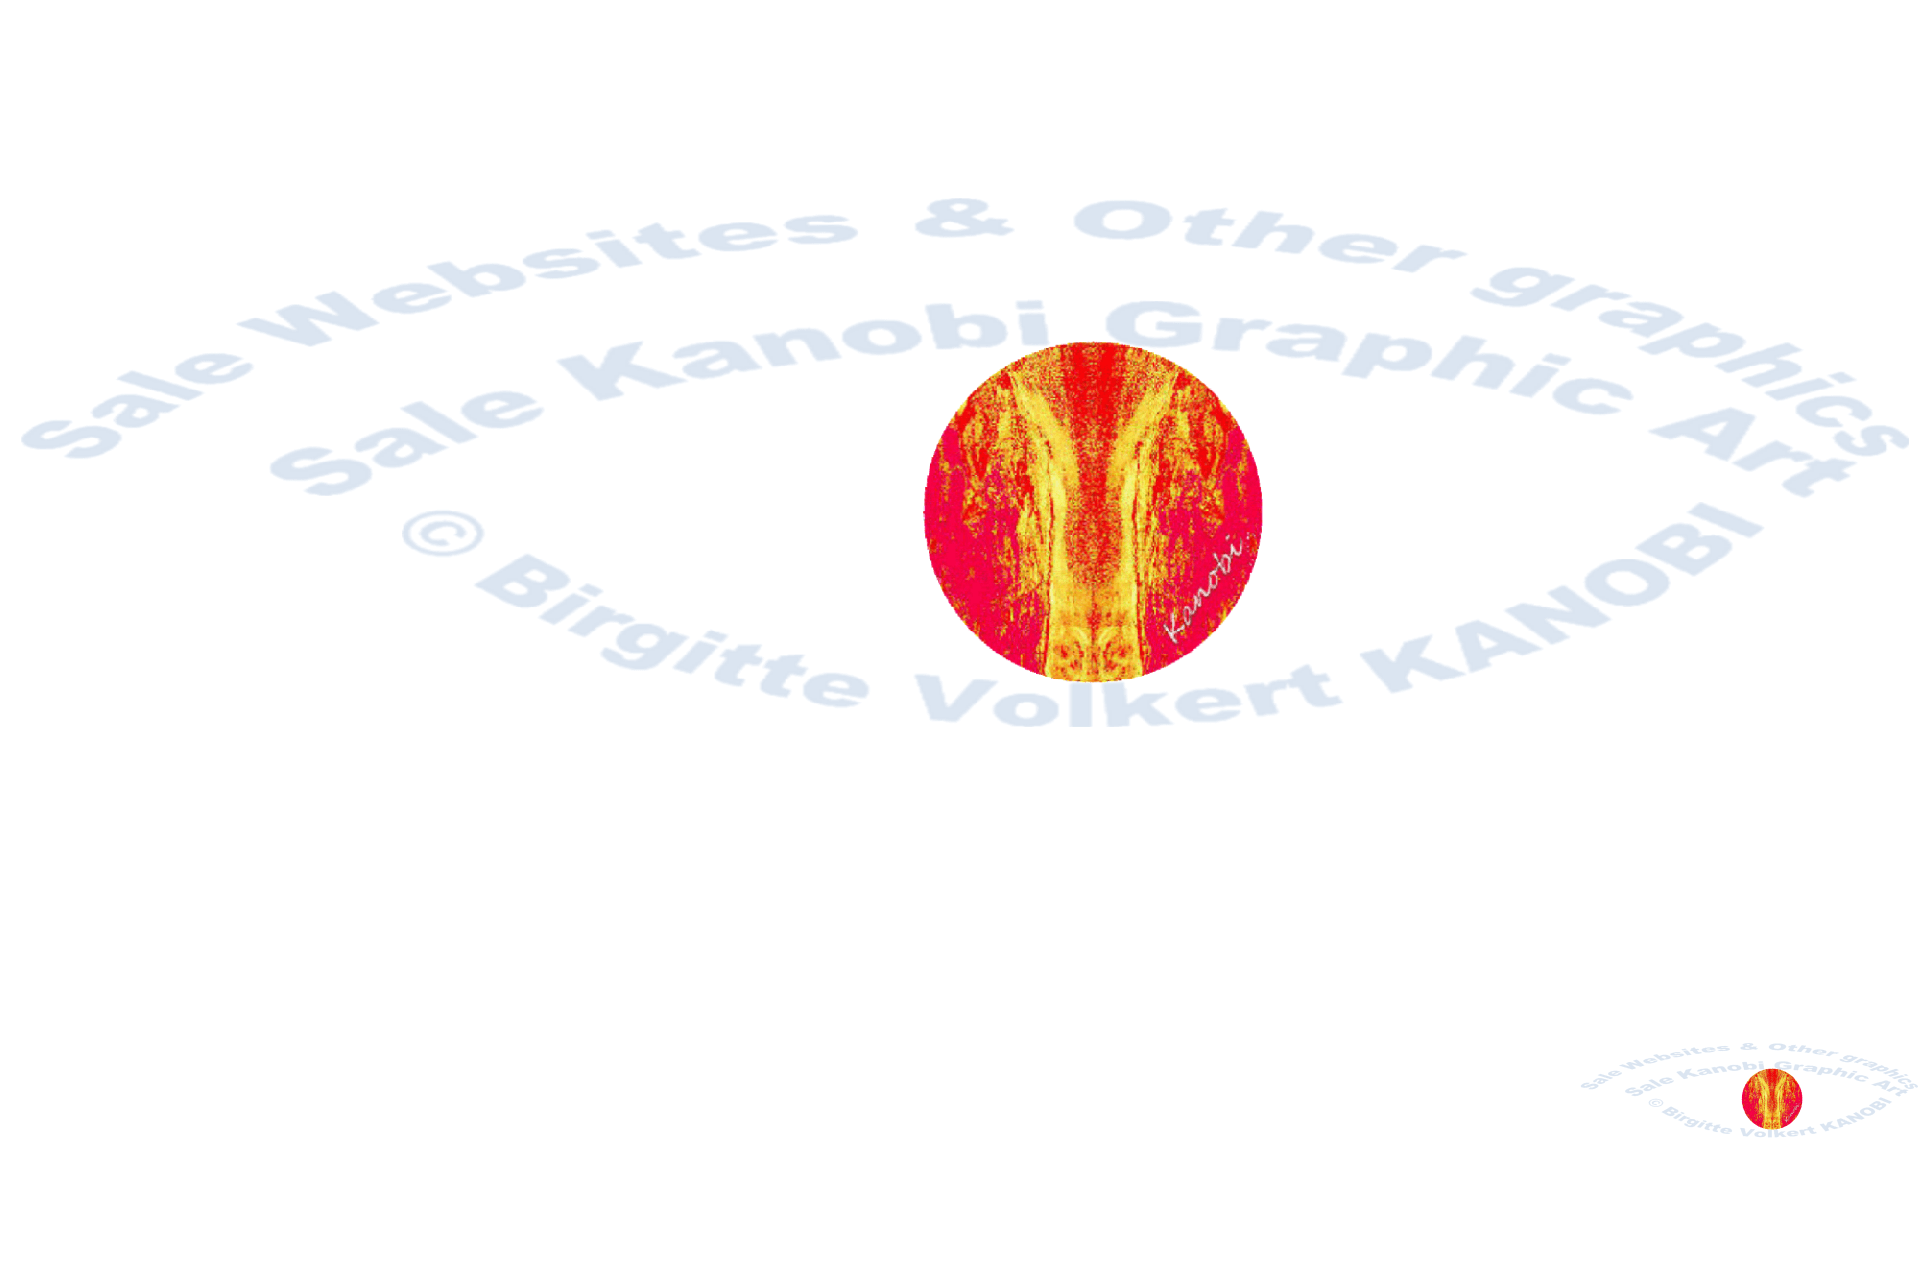 © Kanobi® eye logo tones